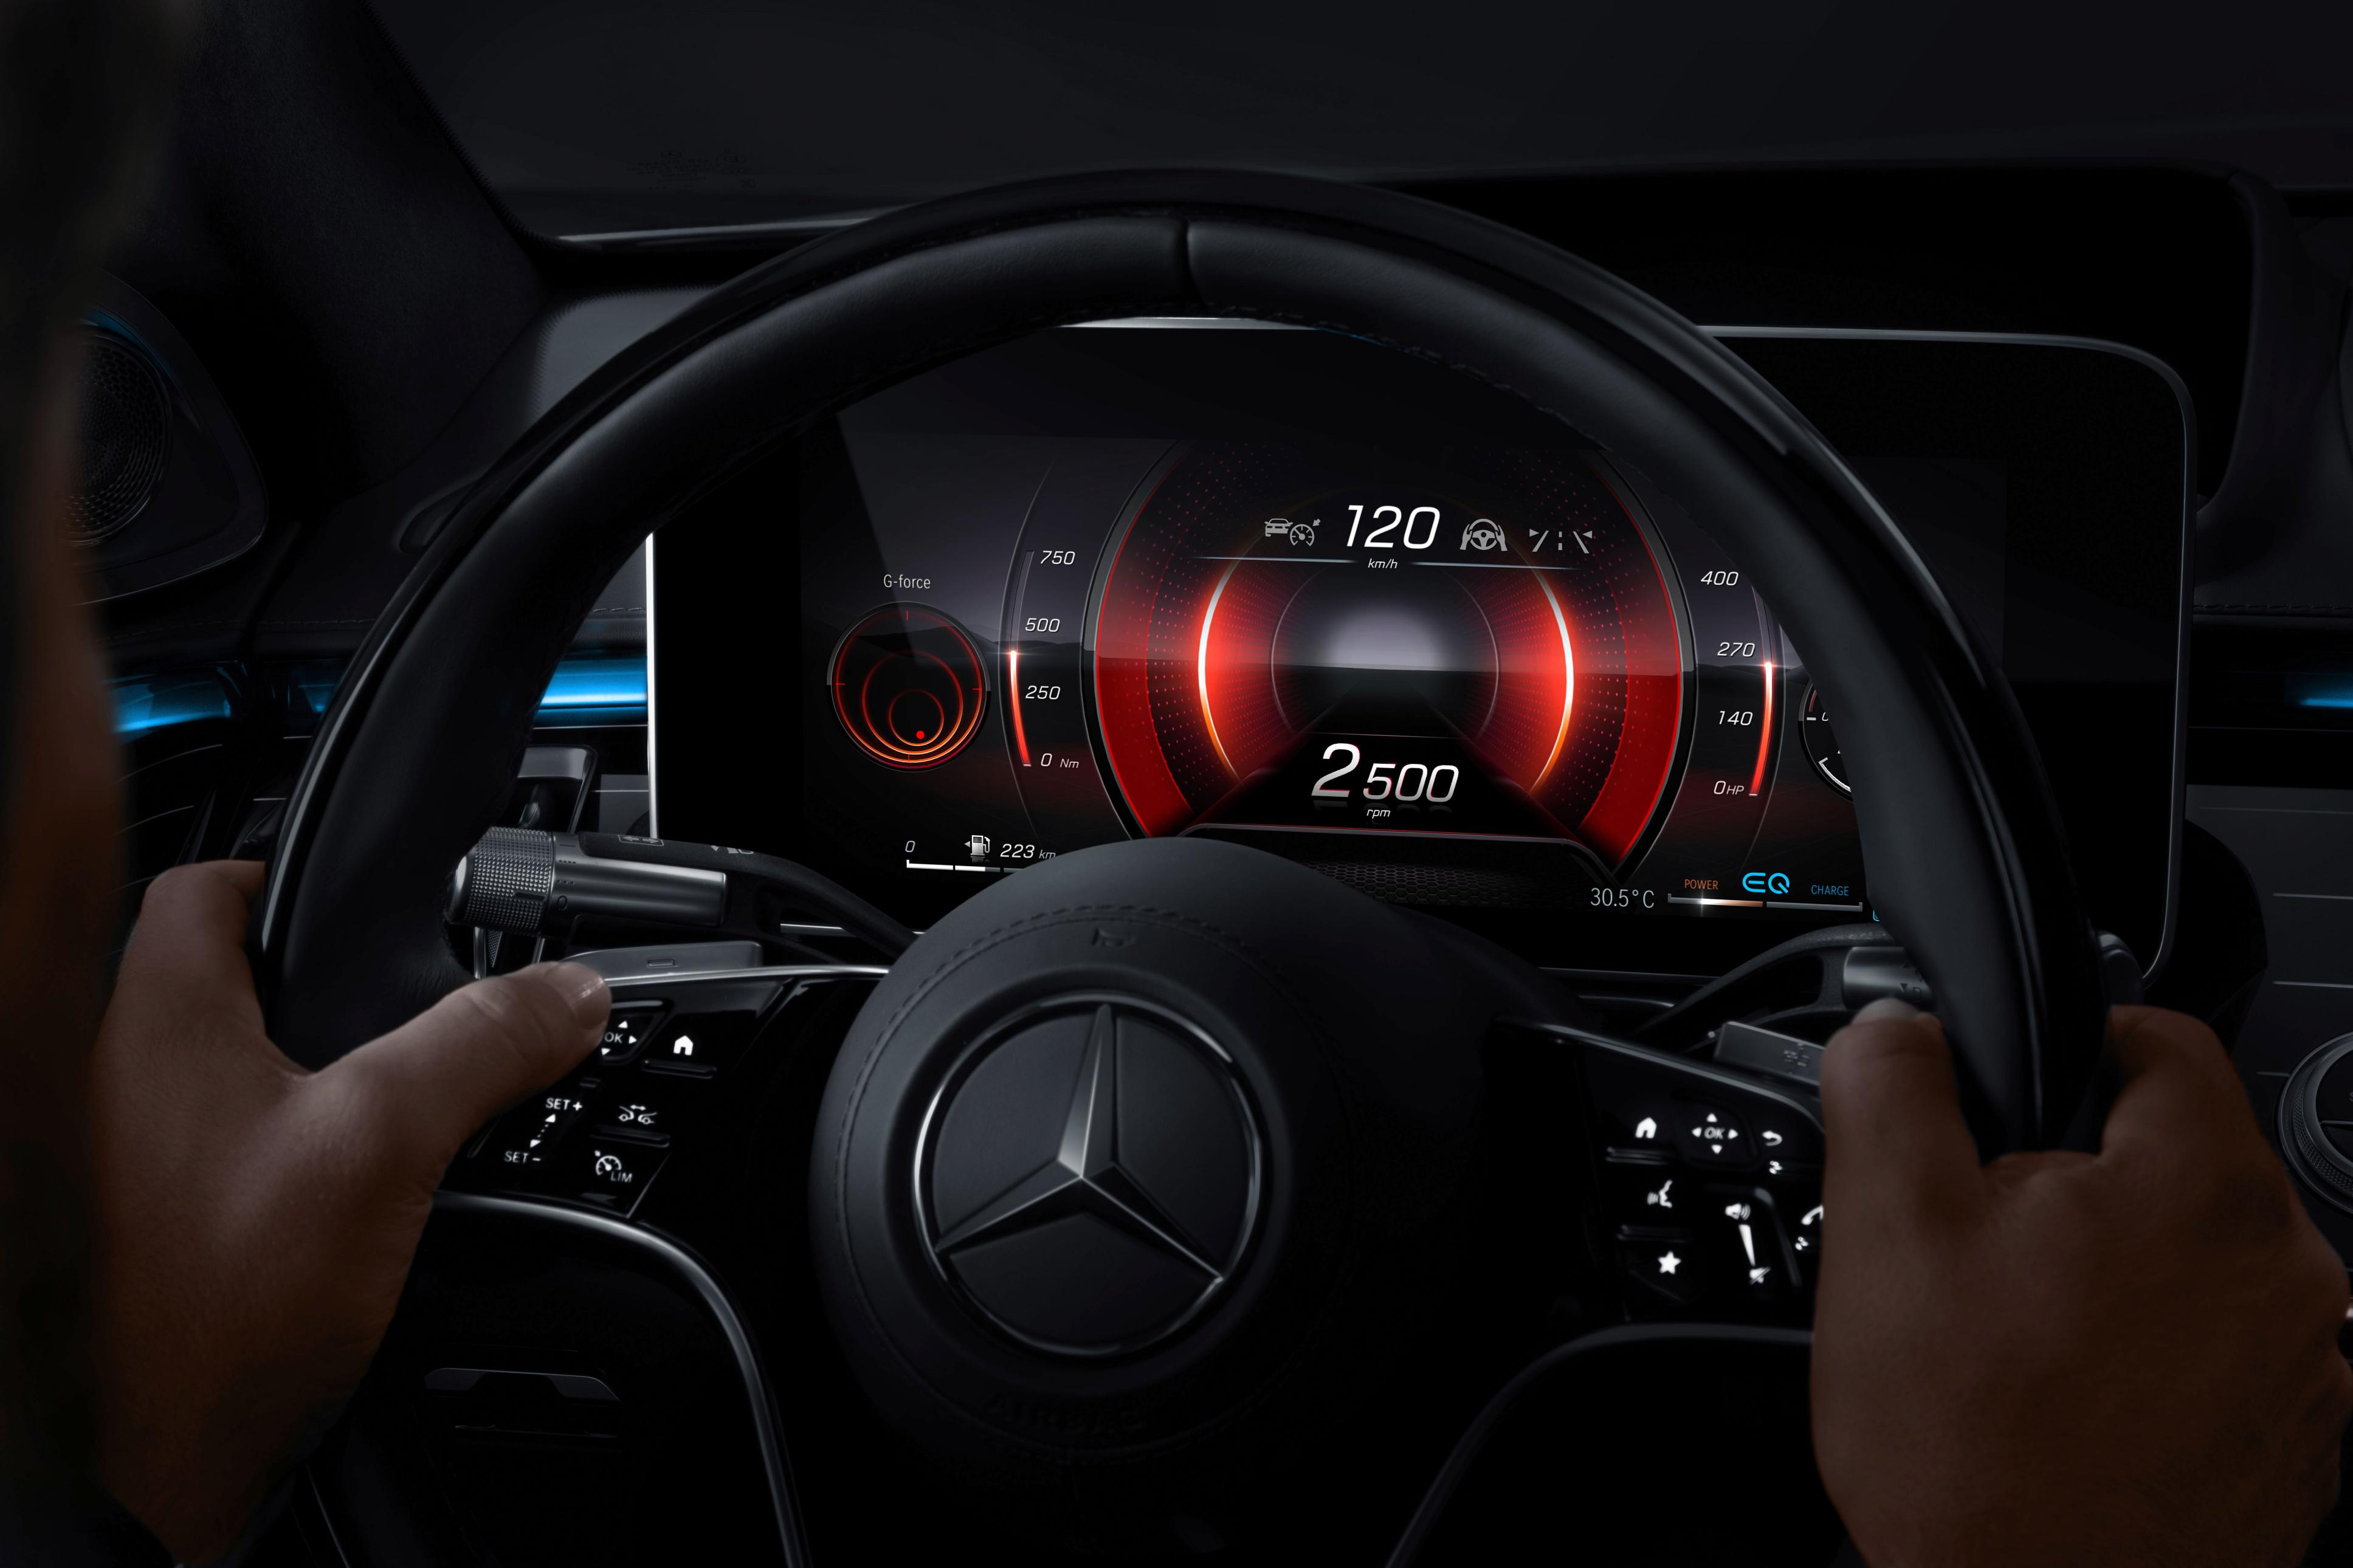 Next-generation digital instrument cluster in 2021 Mercedes S-Class